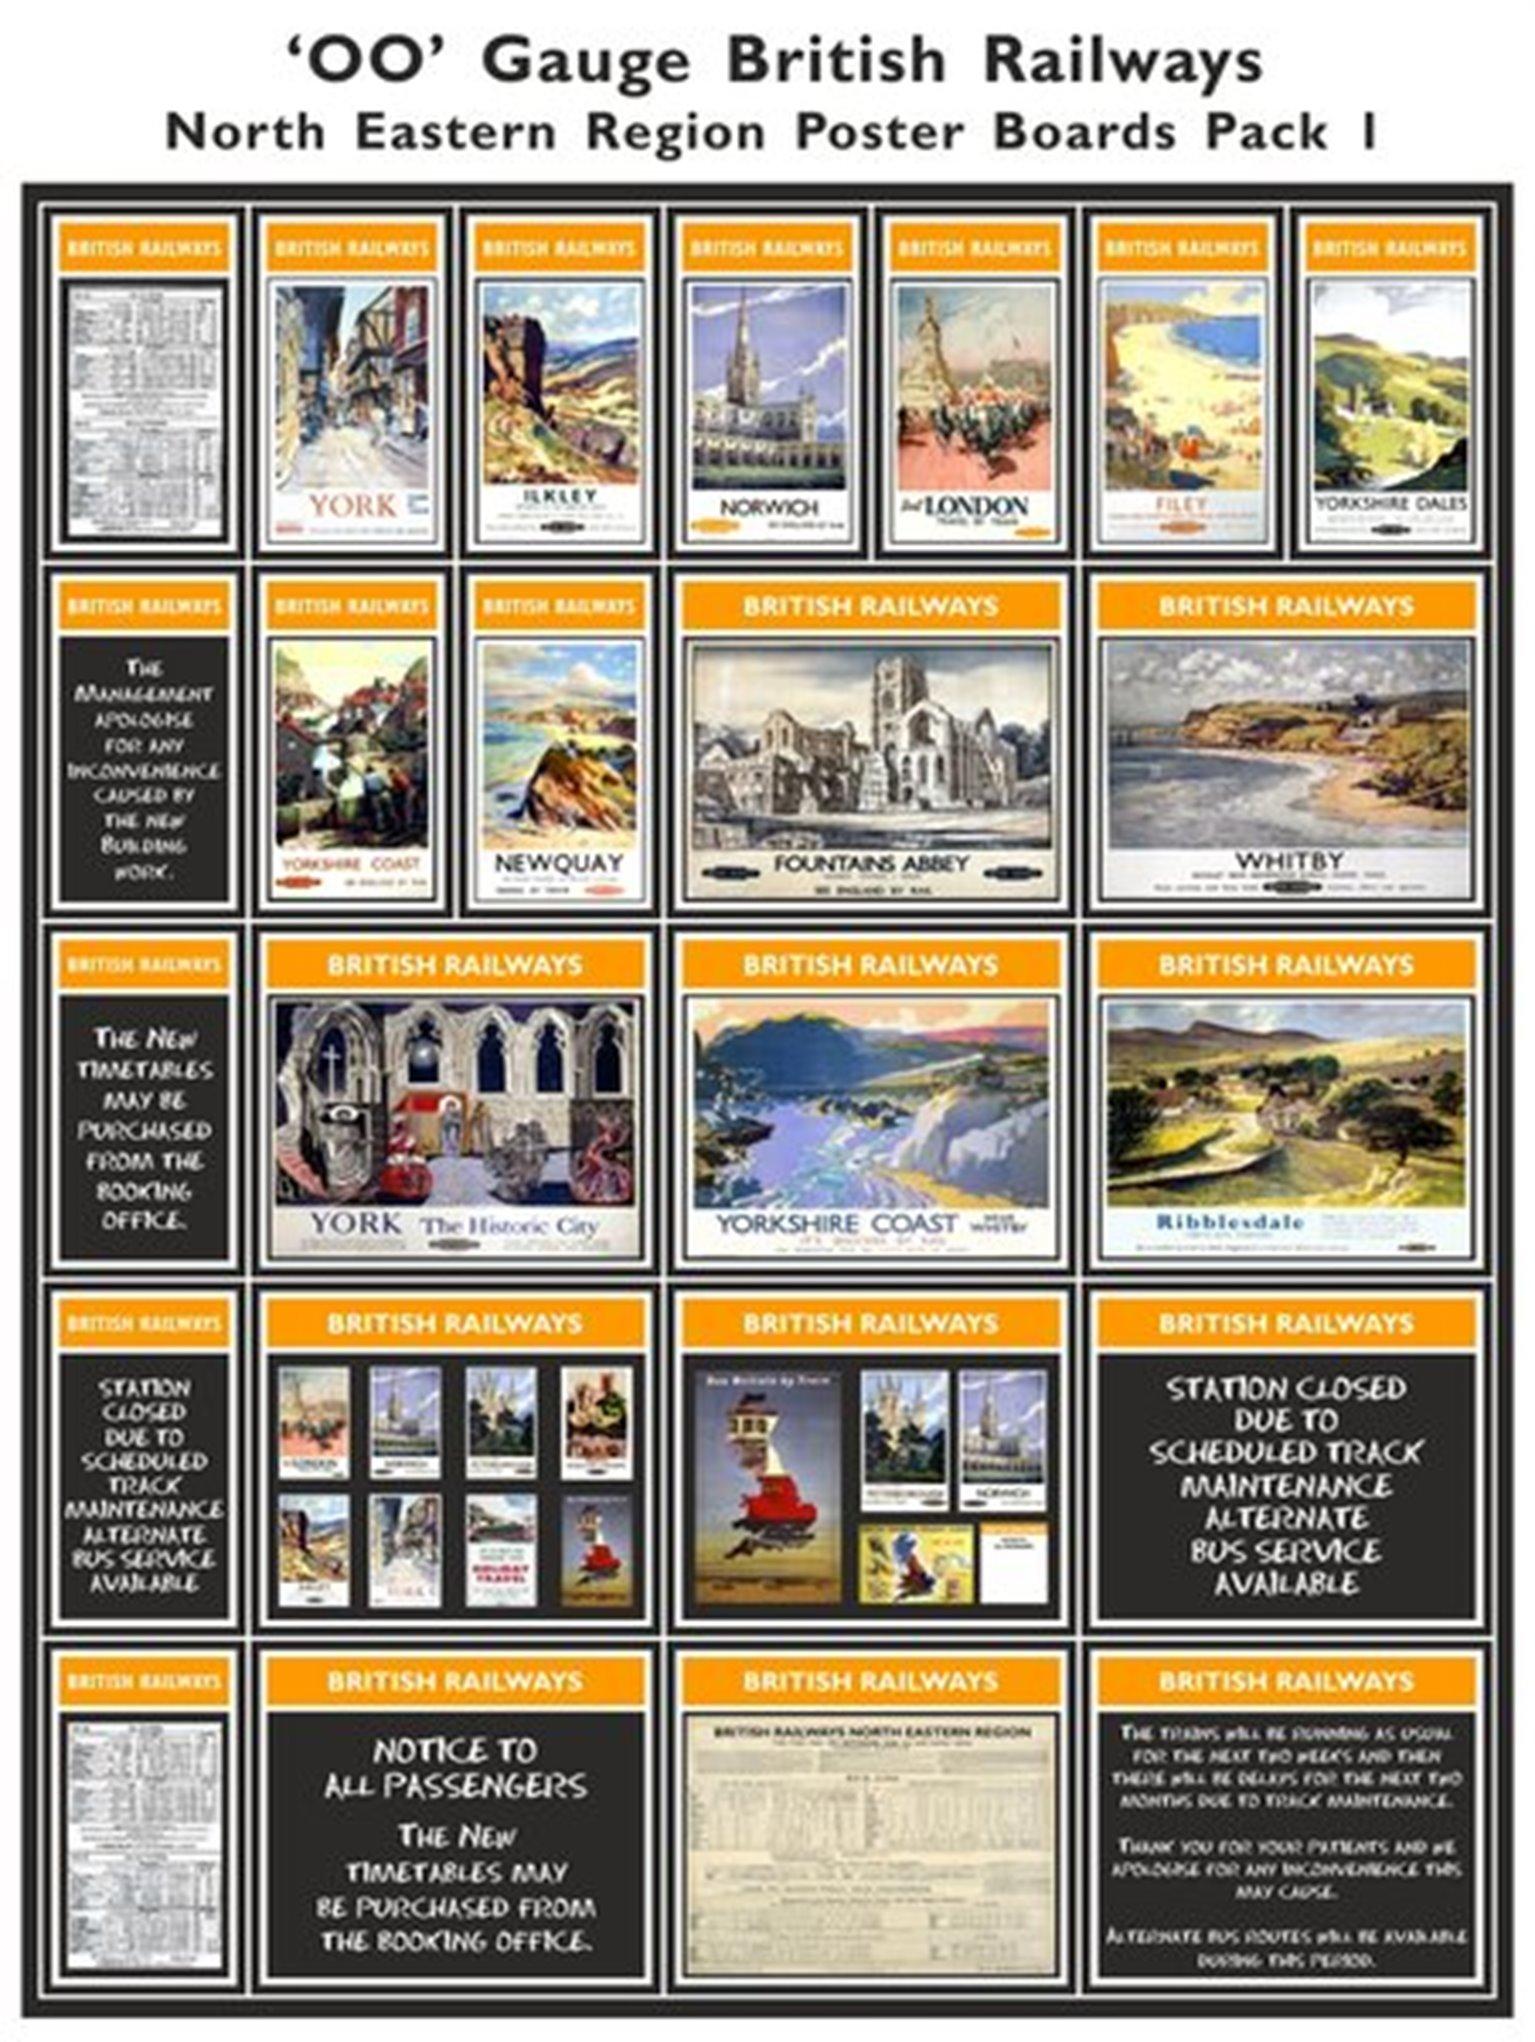 British Railways North Eastern Region Poster Boards Pack 1